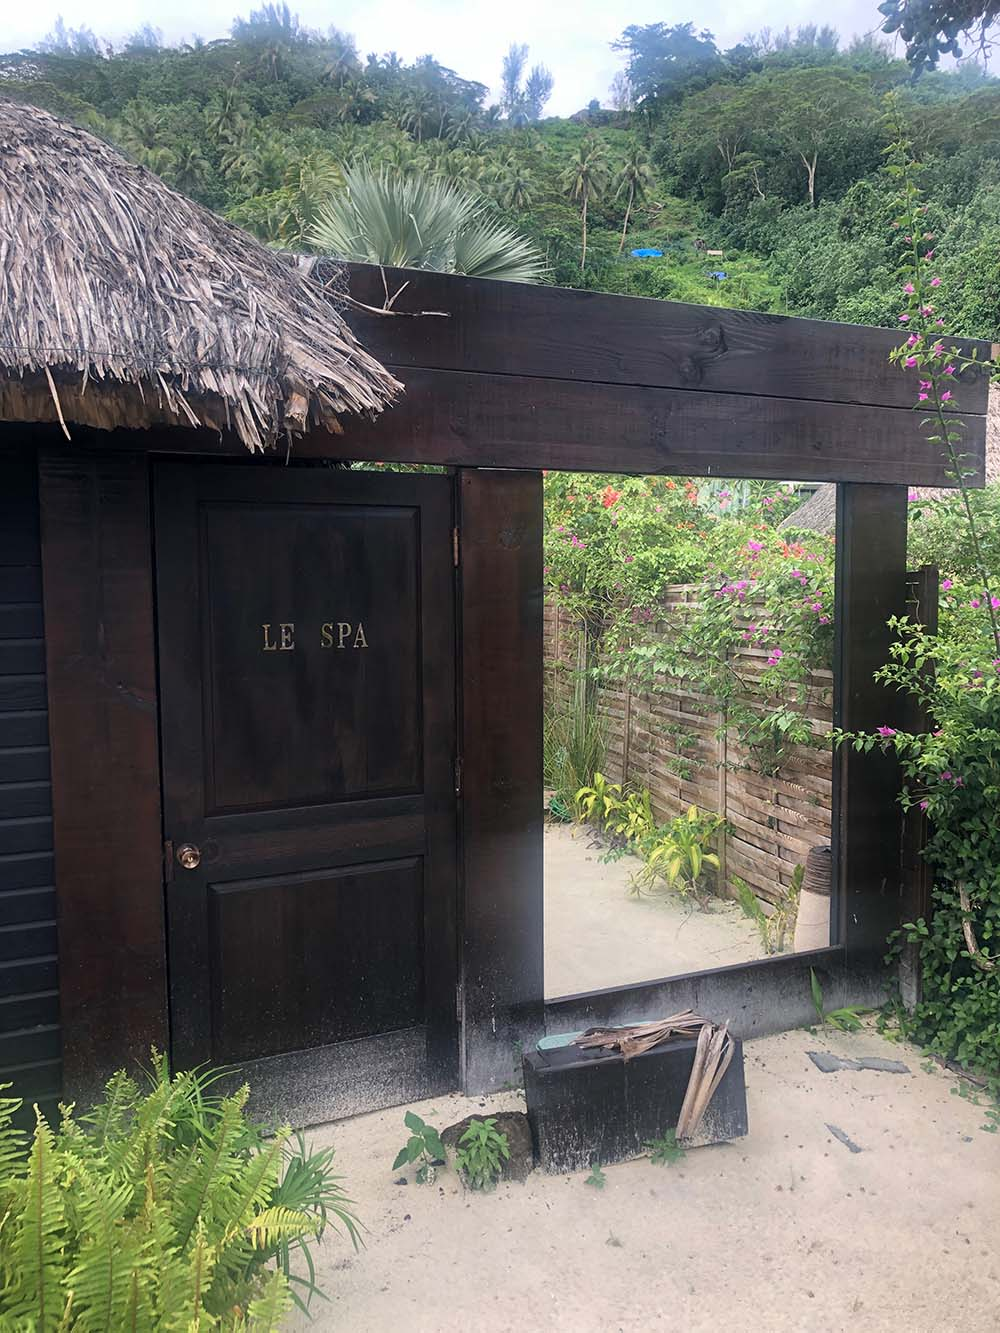 Le Petit Spa Matira is located within the Coqui Coqui Boutique in Bora Bora.